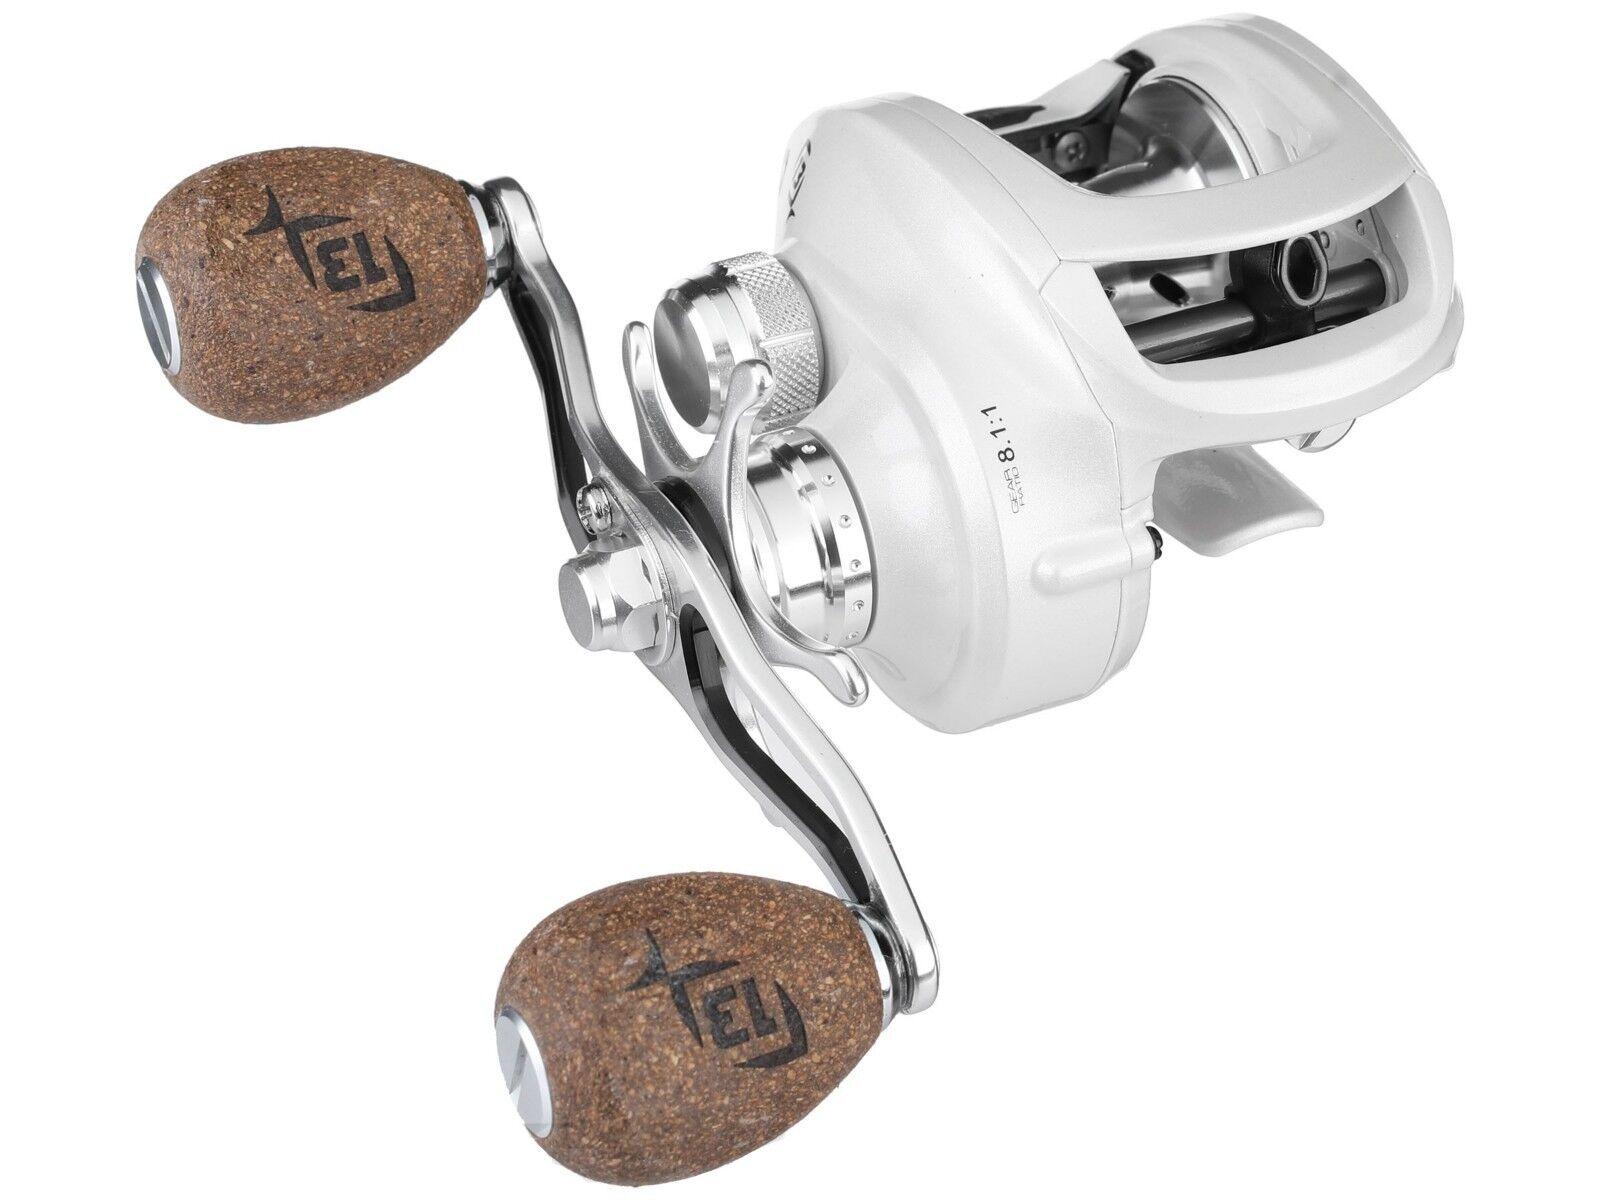 13 Fishing Concept C - Ultra-Light (6.2 oz) Bass Baitcasting Fishing Reel